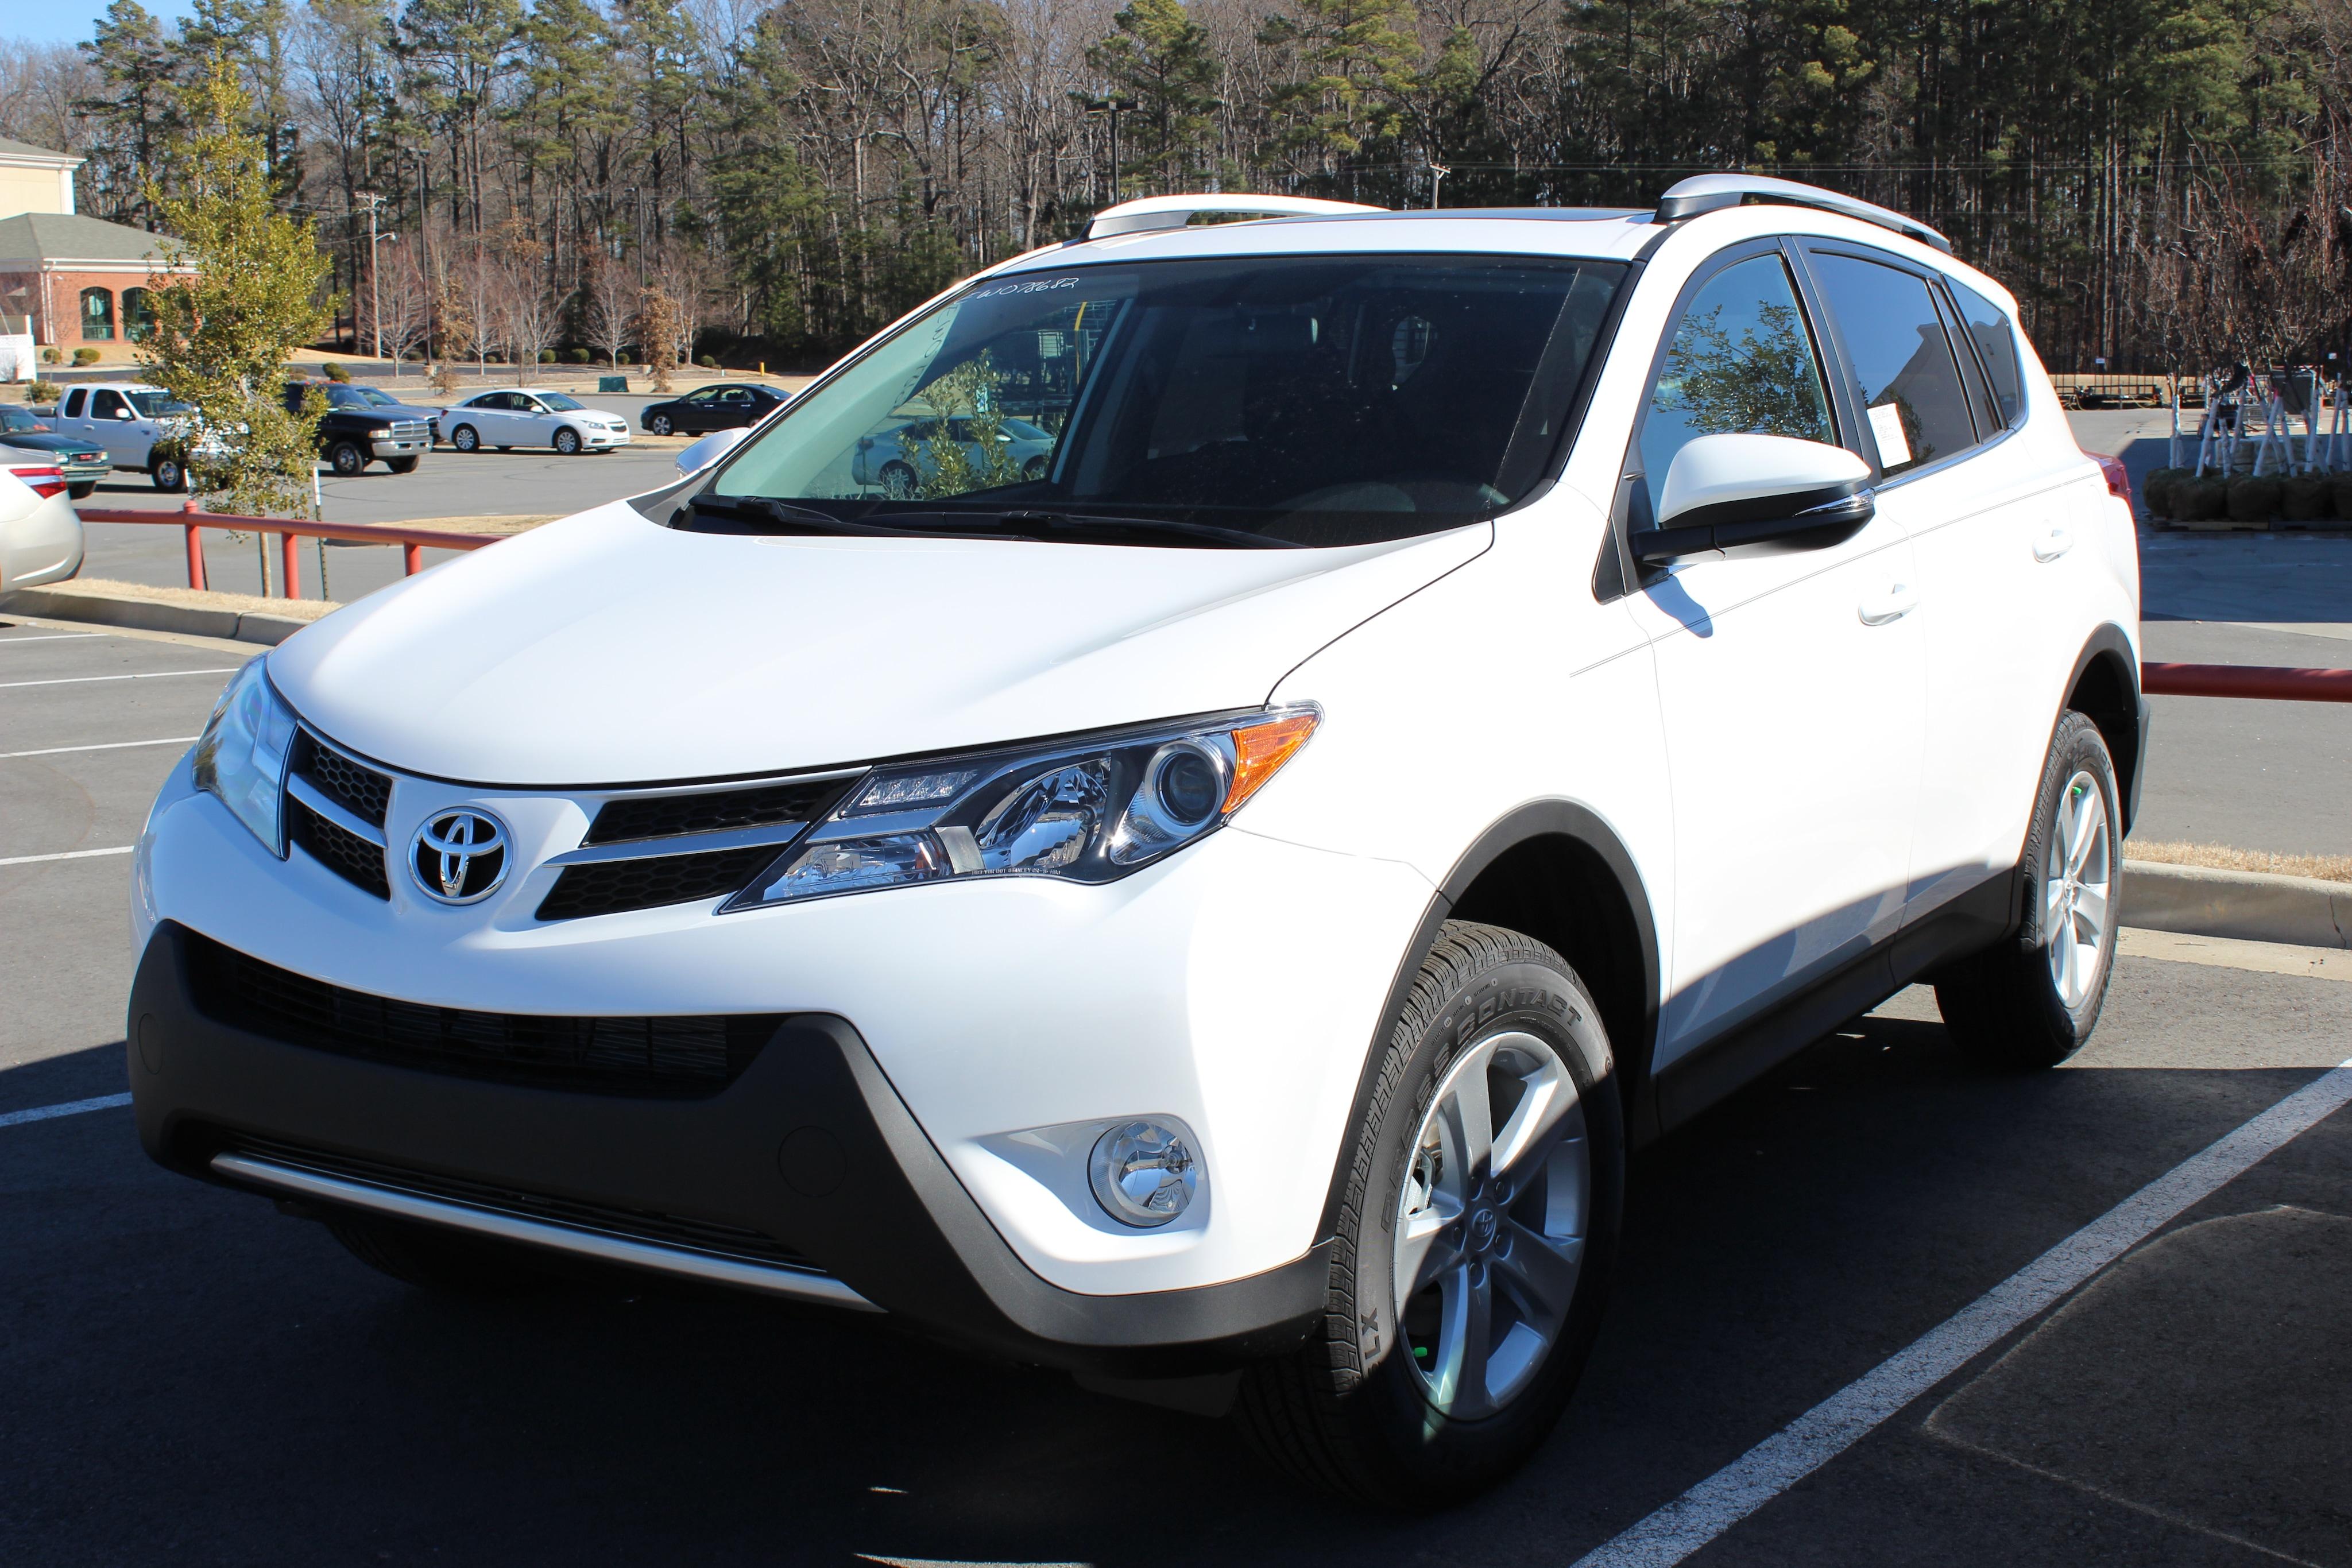 Steve Landers Toyota - Little Rock, AR - Yelp